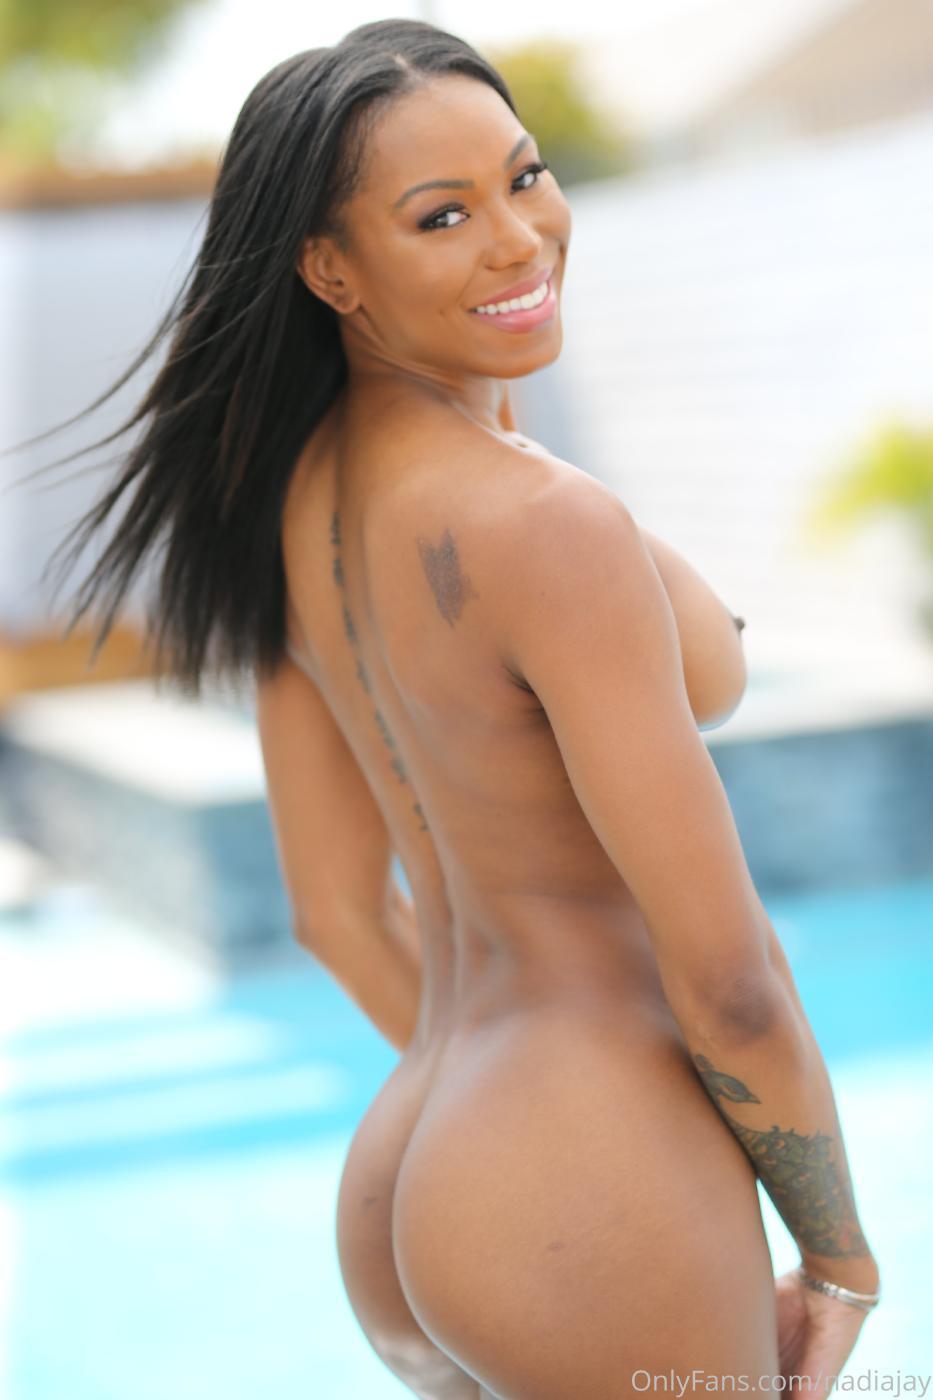 Nadia Jay Nude Lingerie Pool Strip Onlyfans Set Leaked0003